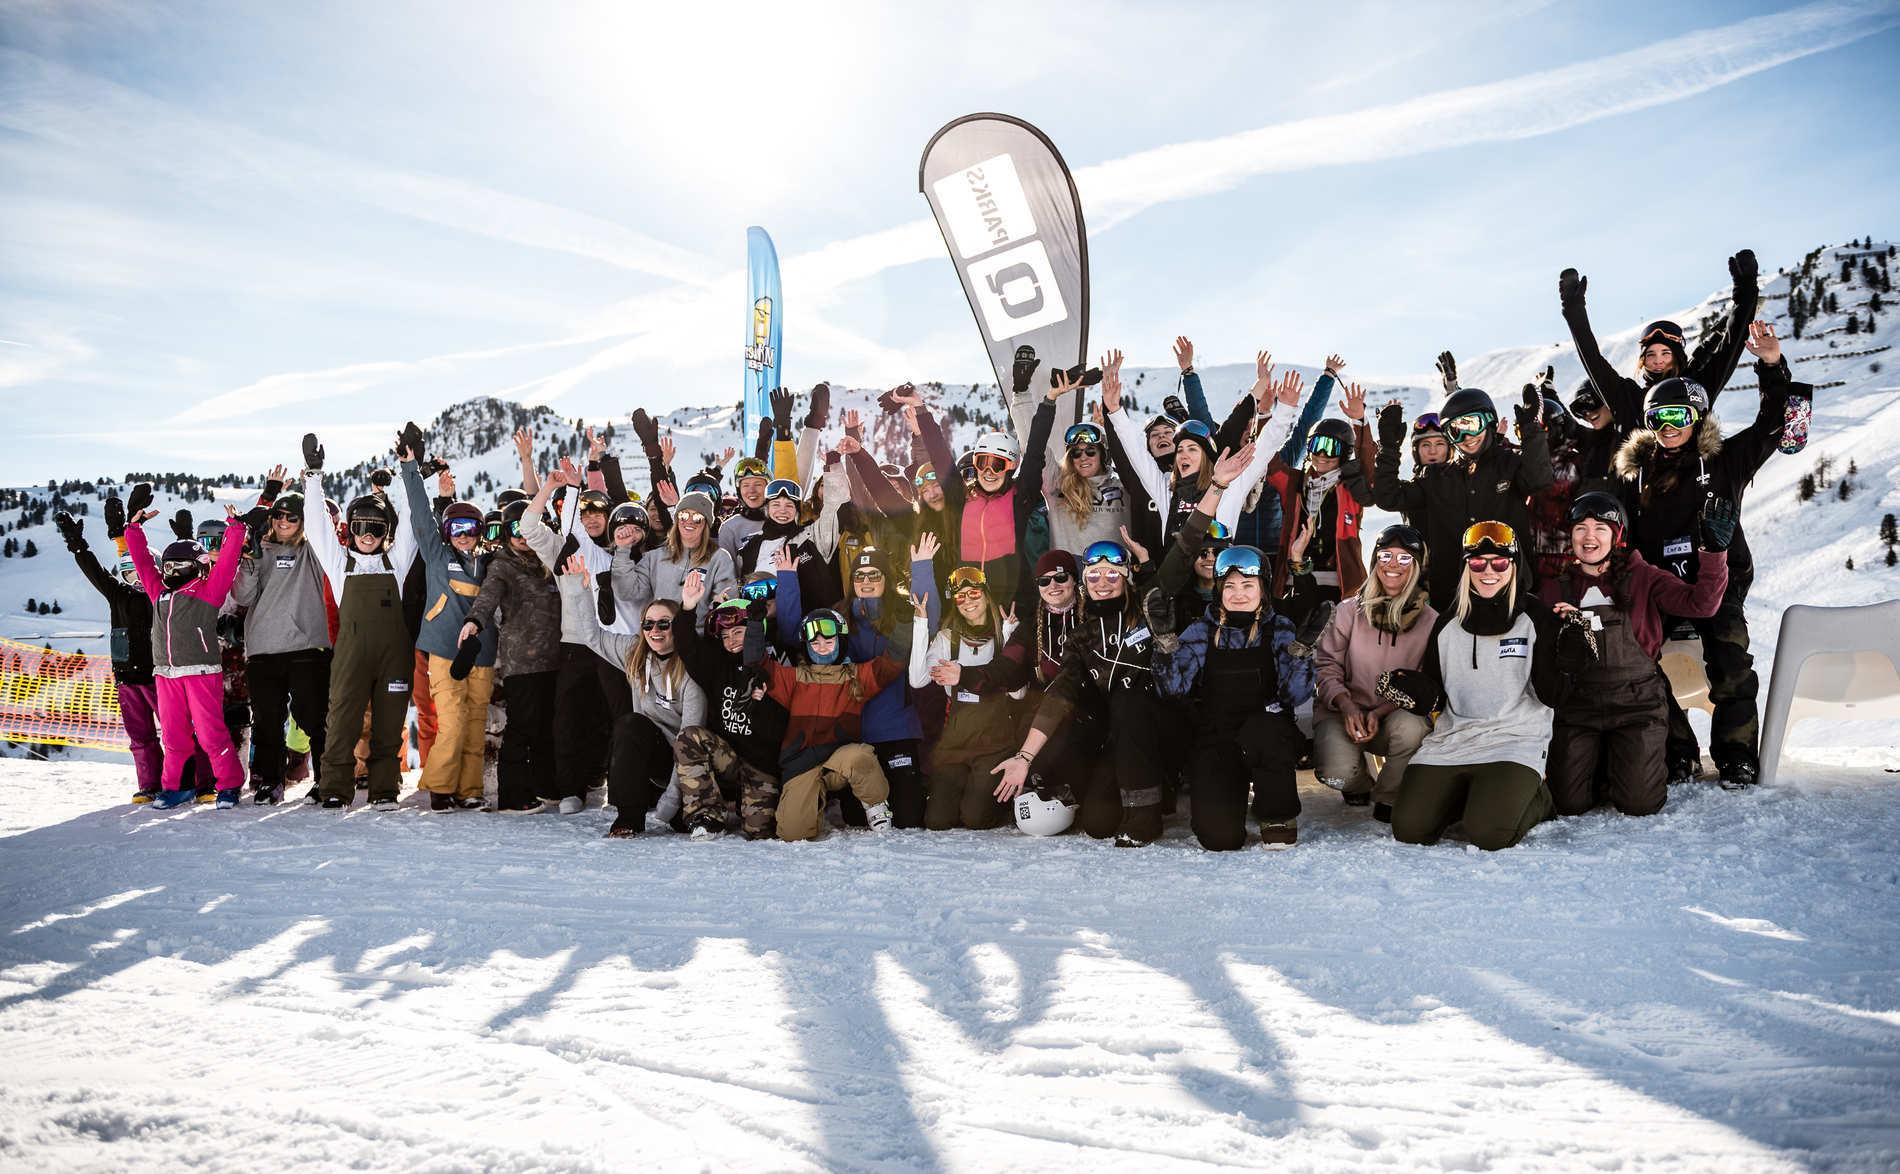 mayrhofen 16 02 2019 lifestyle fs sb christian riefenberg qparks 16